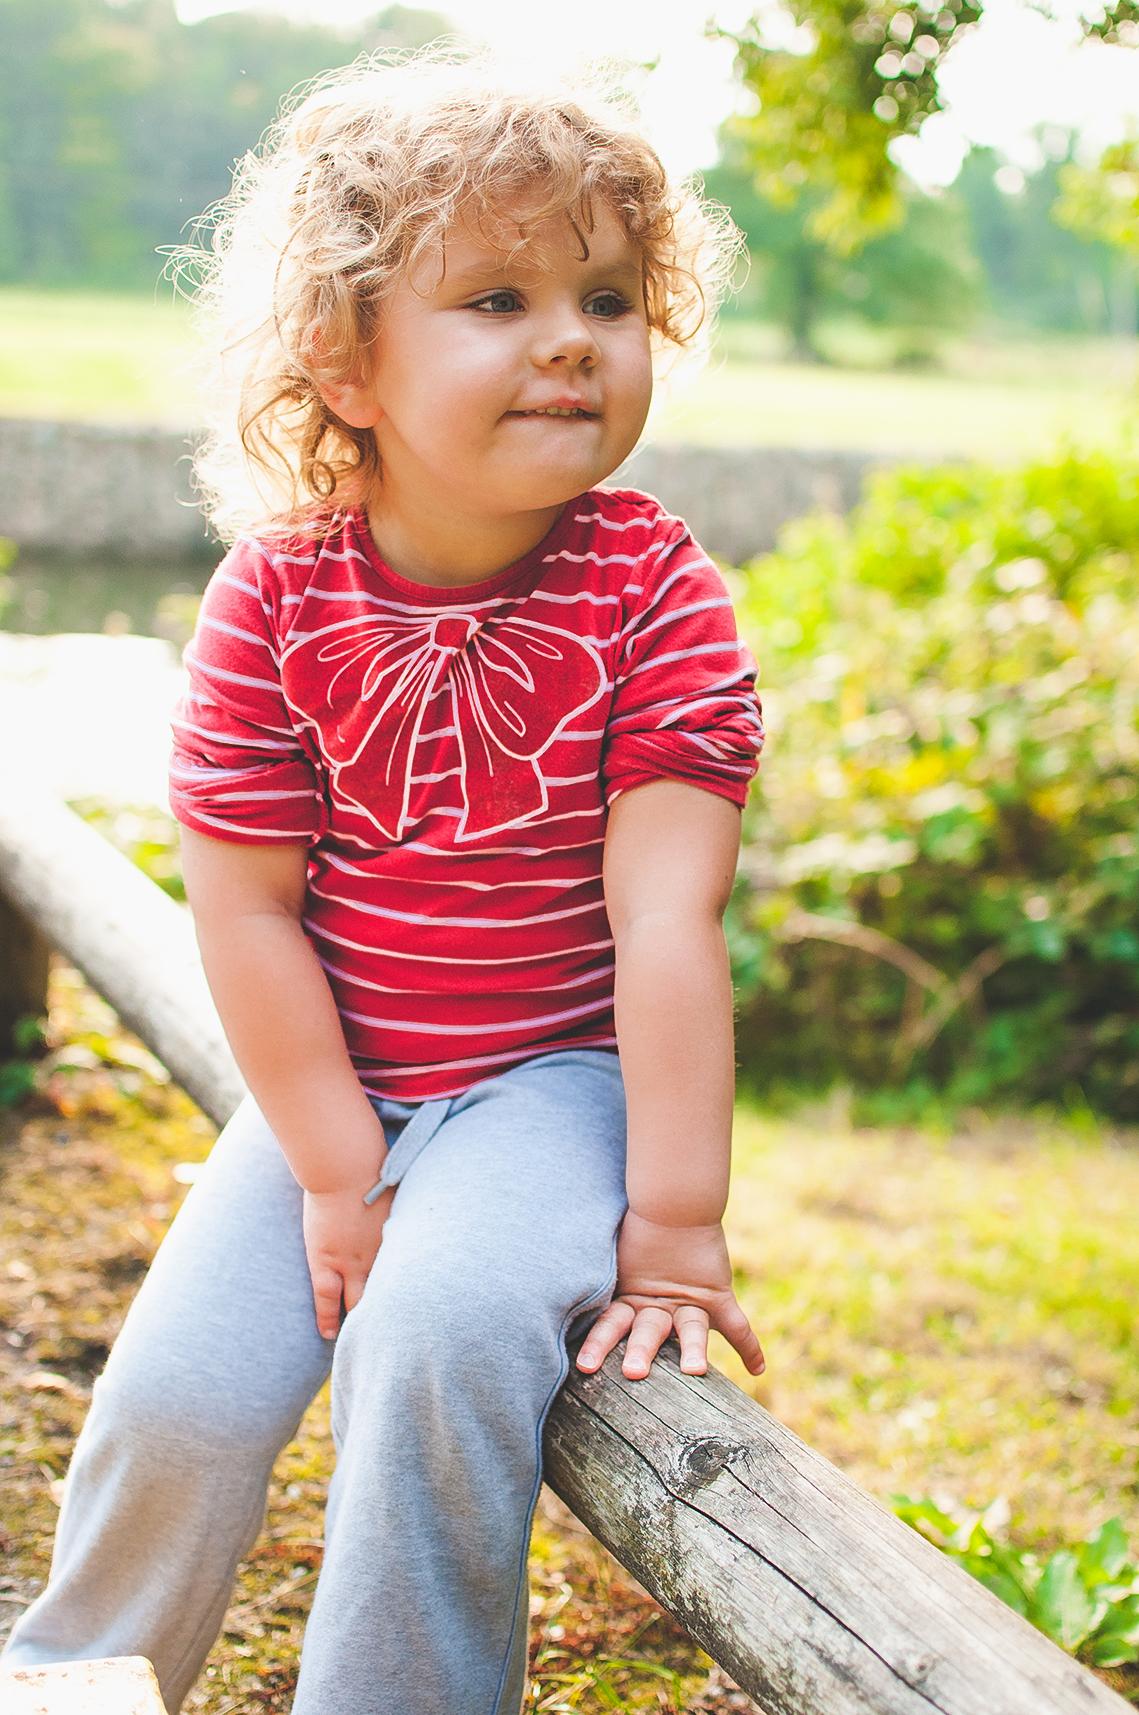 photographer cahir tipperary clonmel cashel portrait 1.jpg